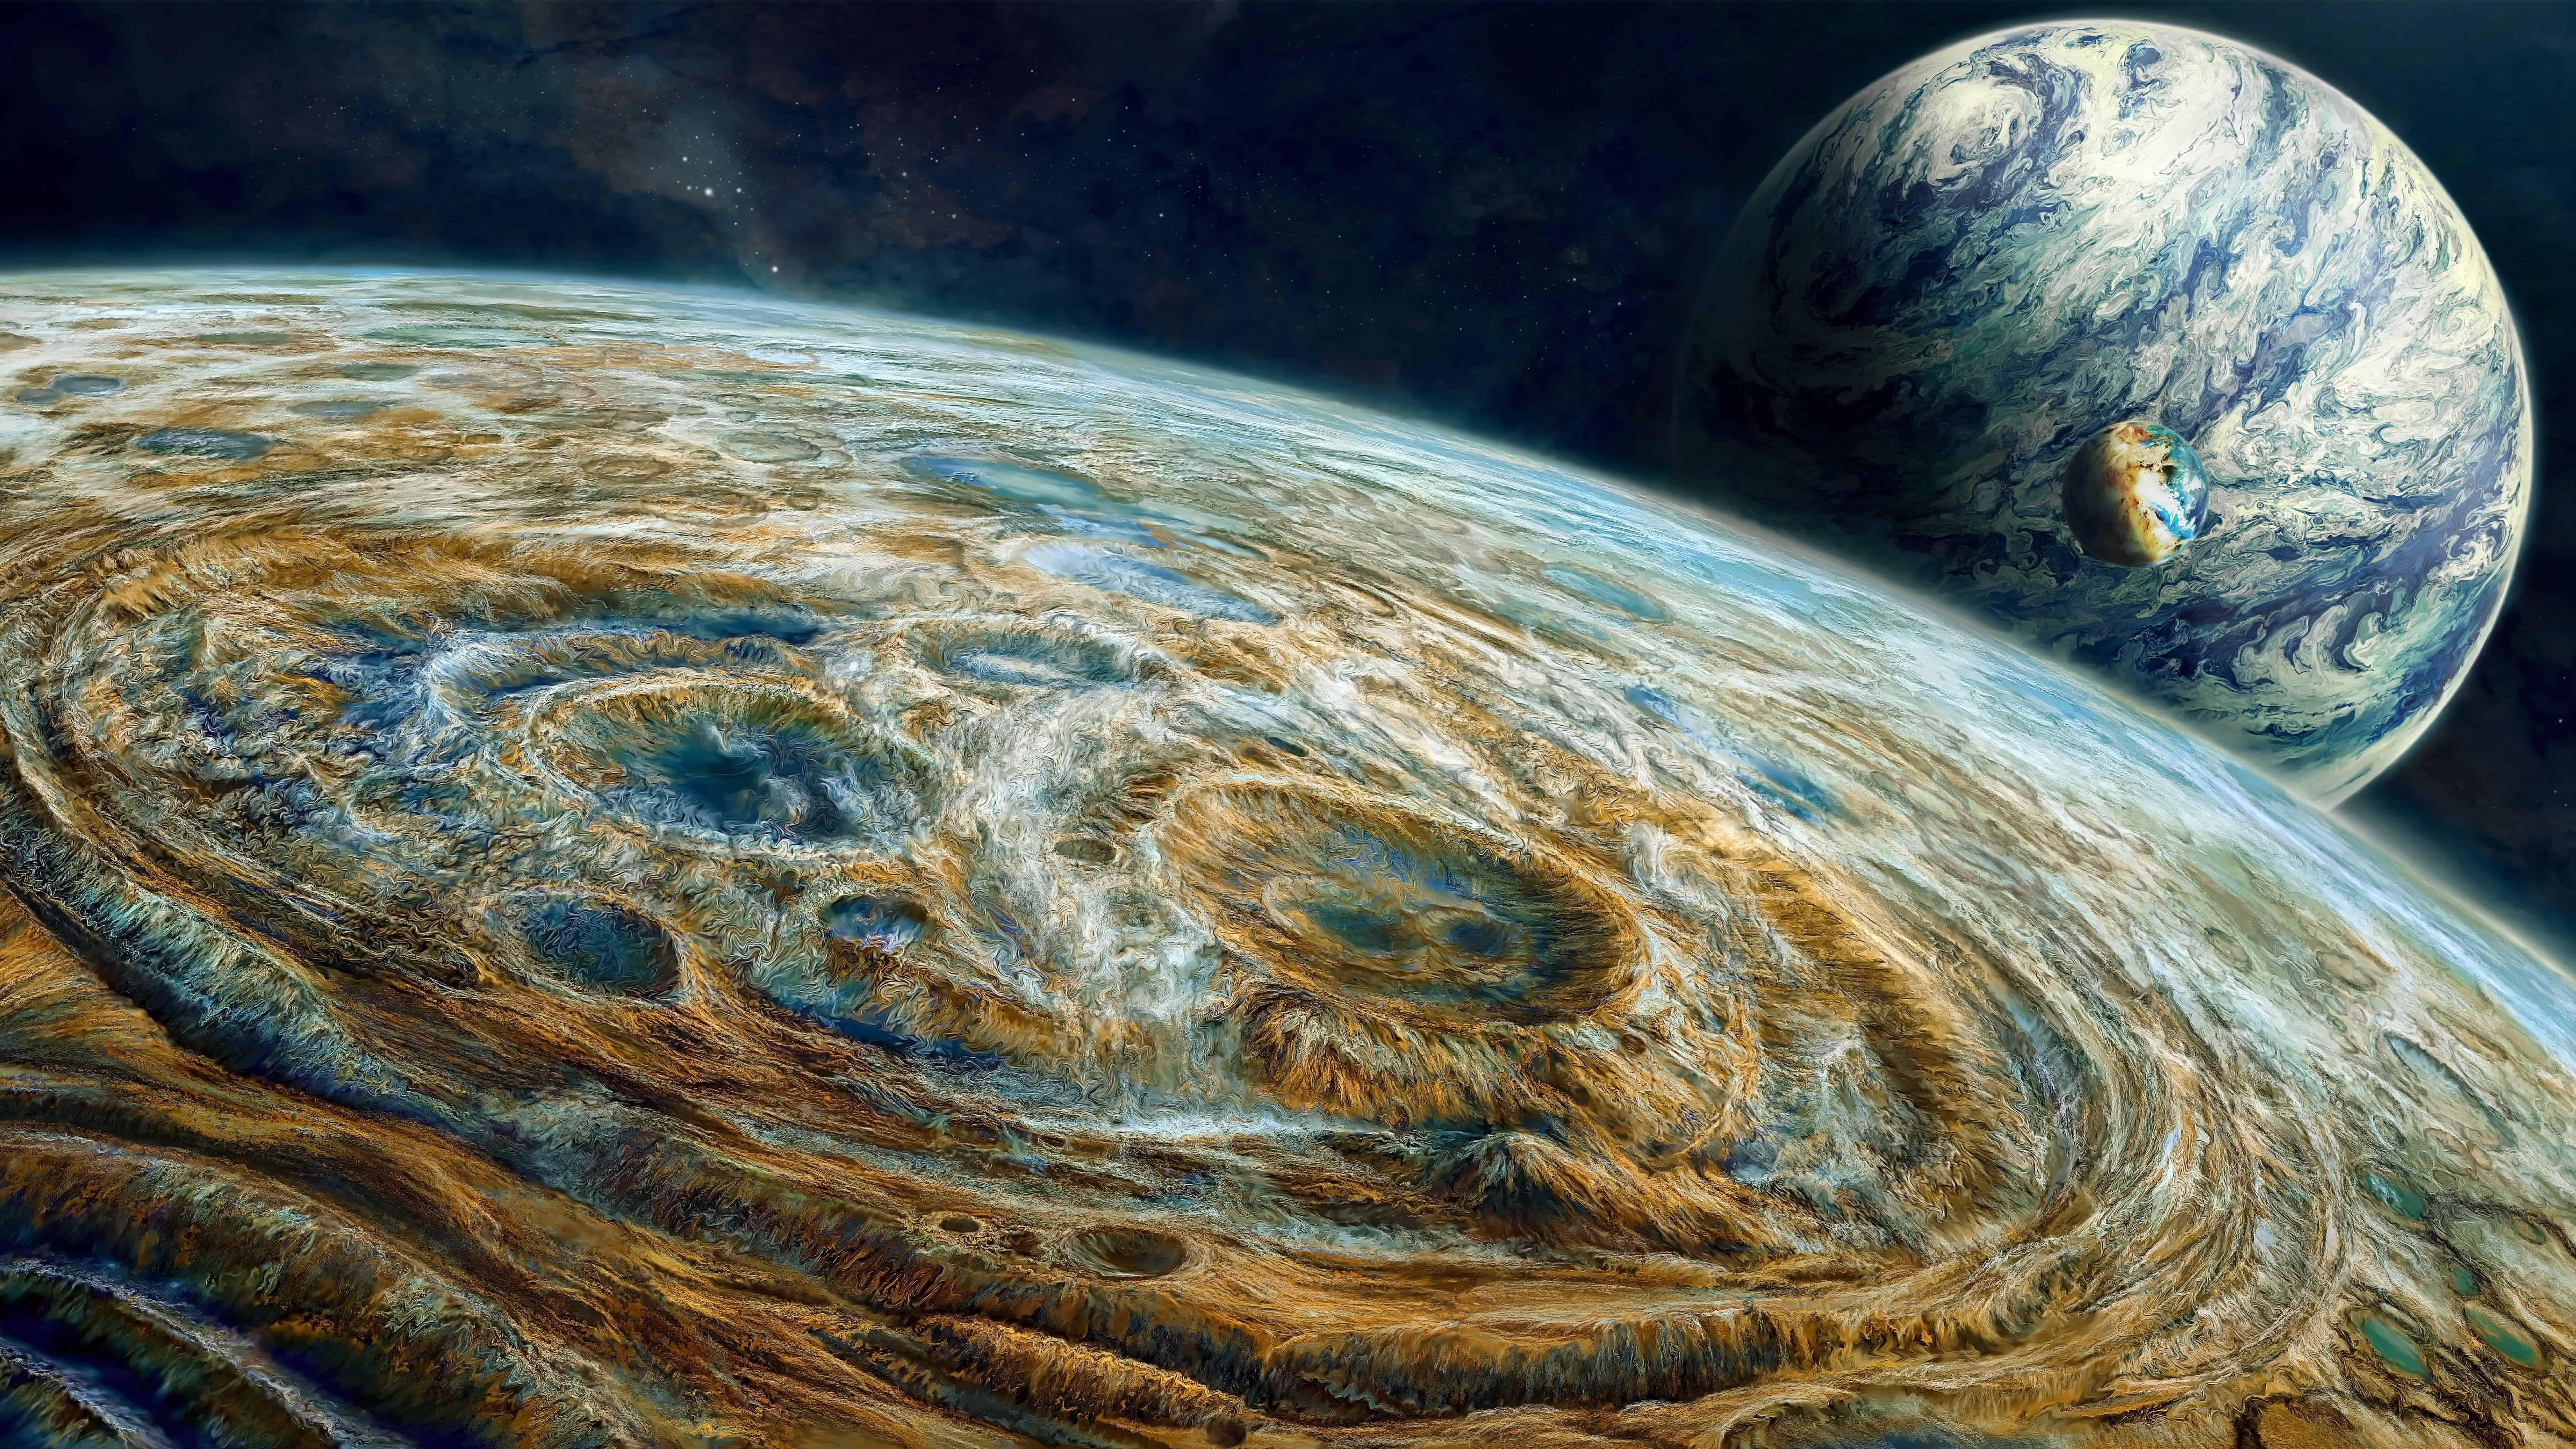 planet surface uhd 8k wallpaper